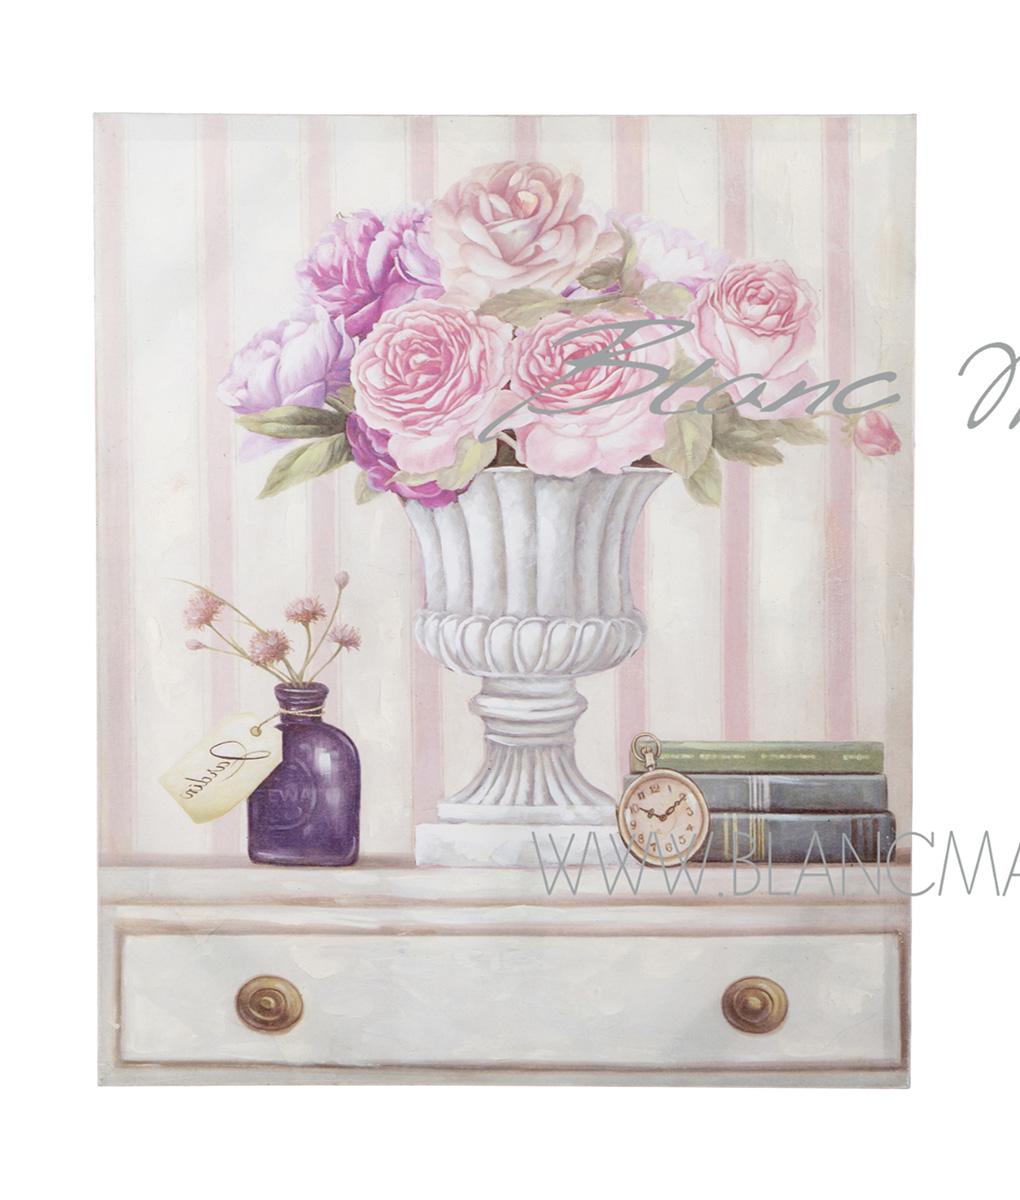 Quadro vaso con rose cm 50x60x3 blanc mariclo 39 reggio emilia for Quadro shabby